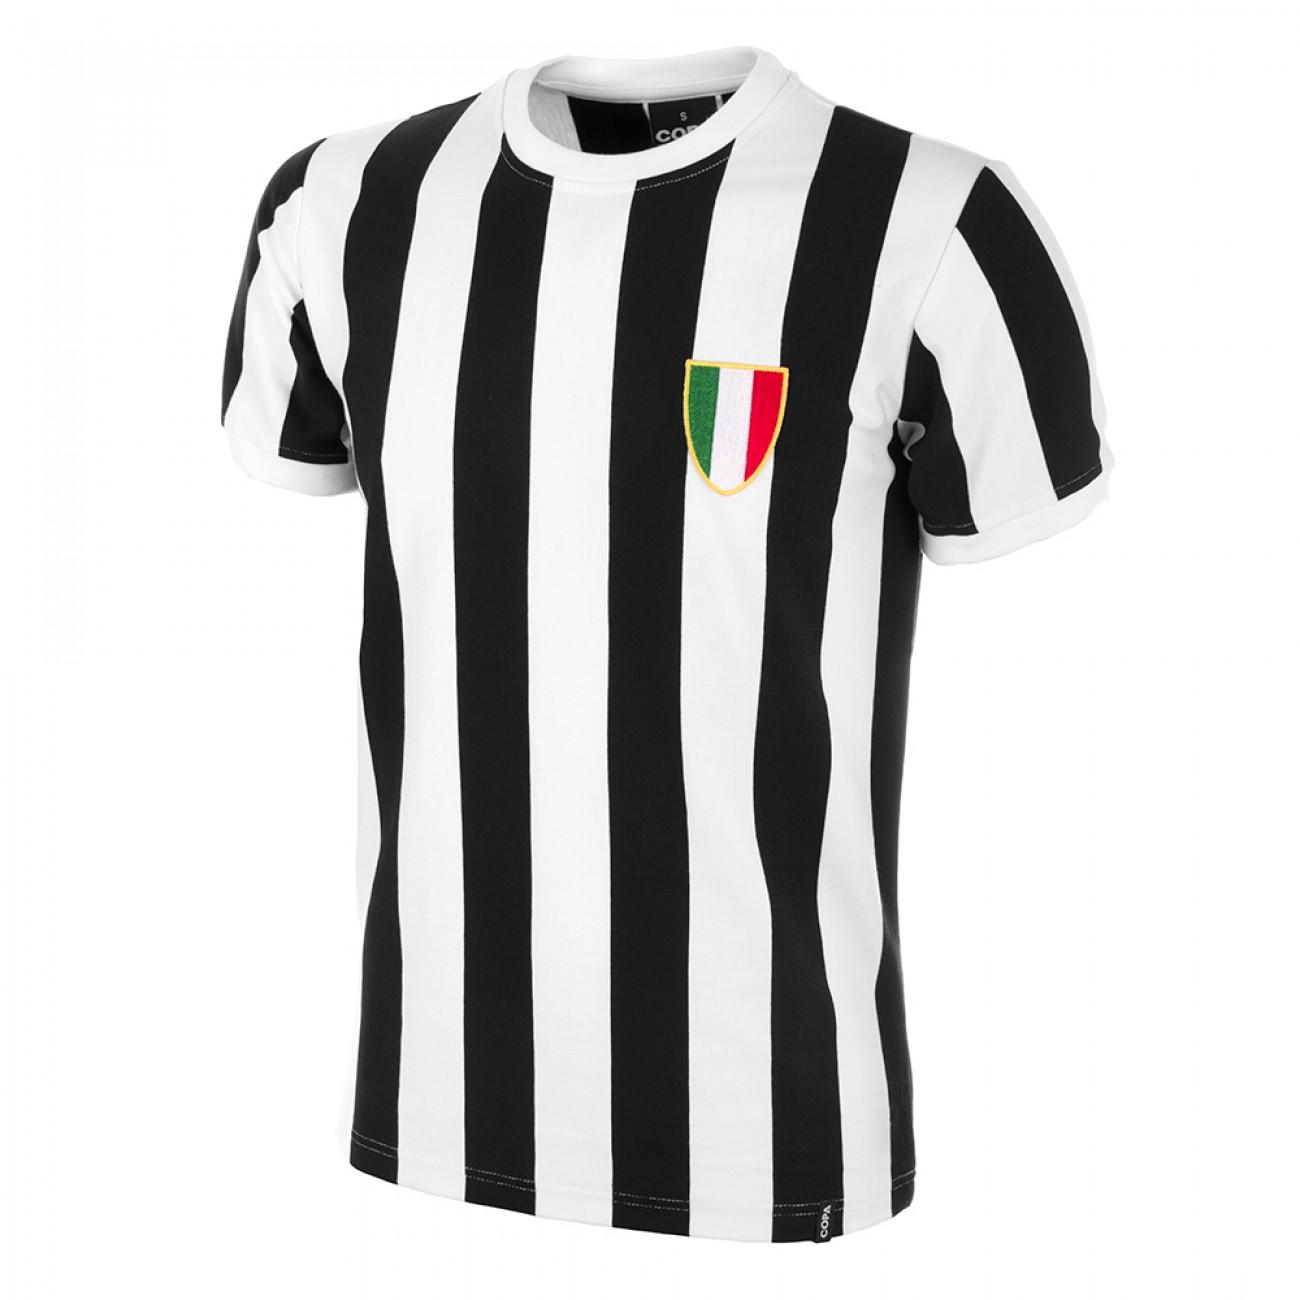 http://www.retrofootball.es/ropa-de-futbol/camiseta-juventus-a-os-70.html